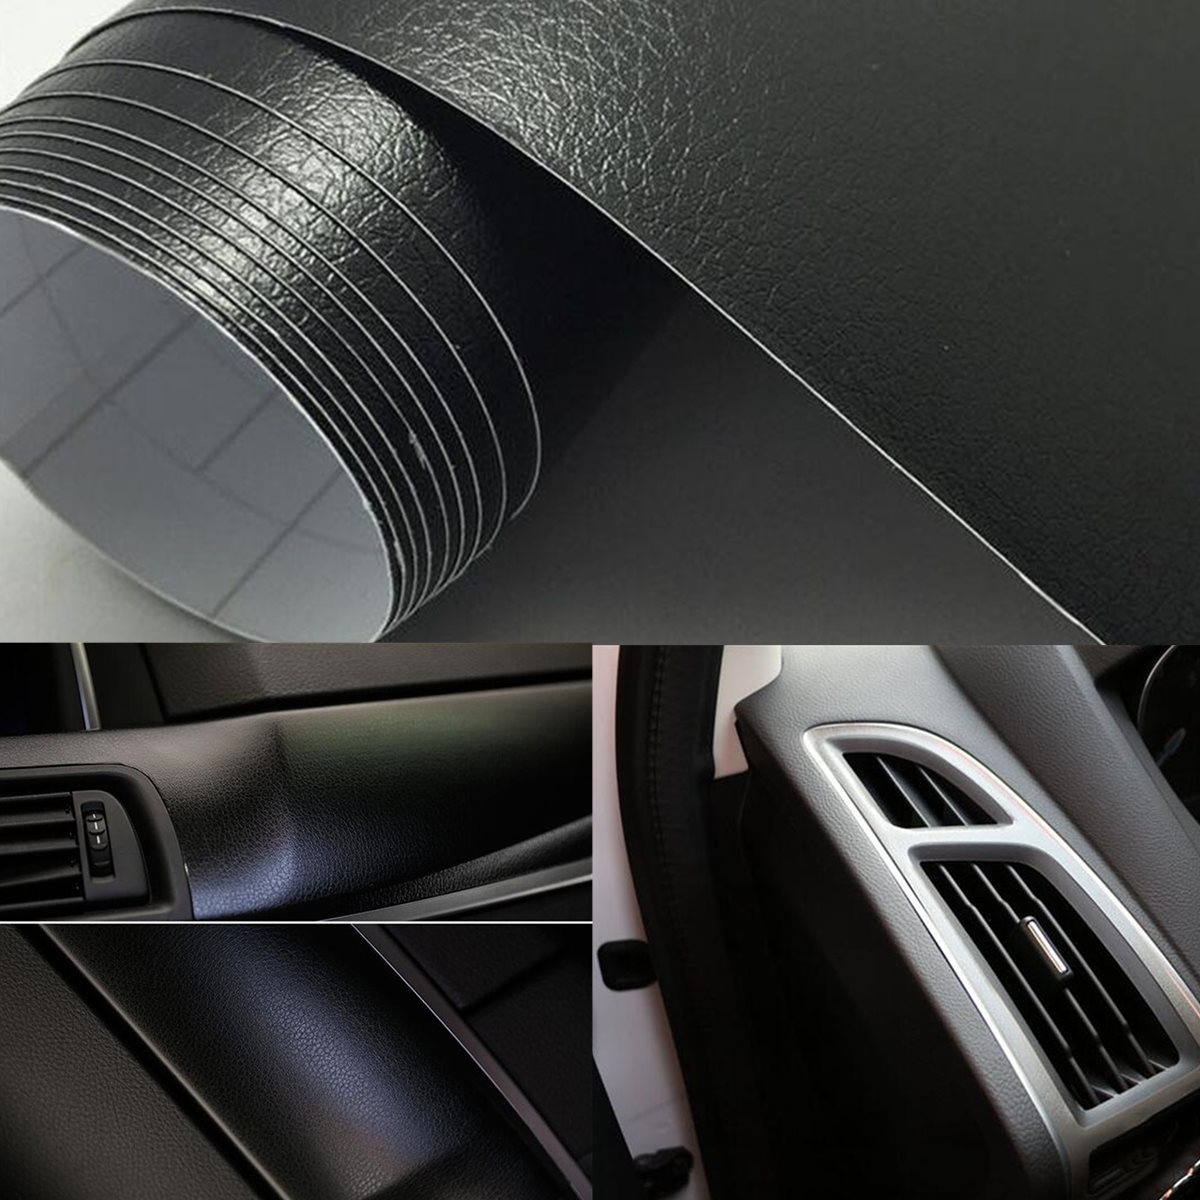 New 12 Inch X 60 Inch PU Leather Texture Car Vinyl Wrap Sticker Car Inner Sticker Decal Film Car Styling